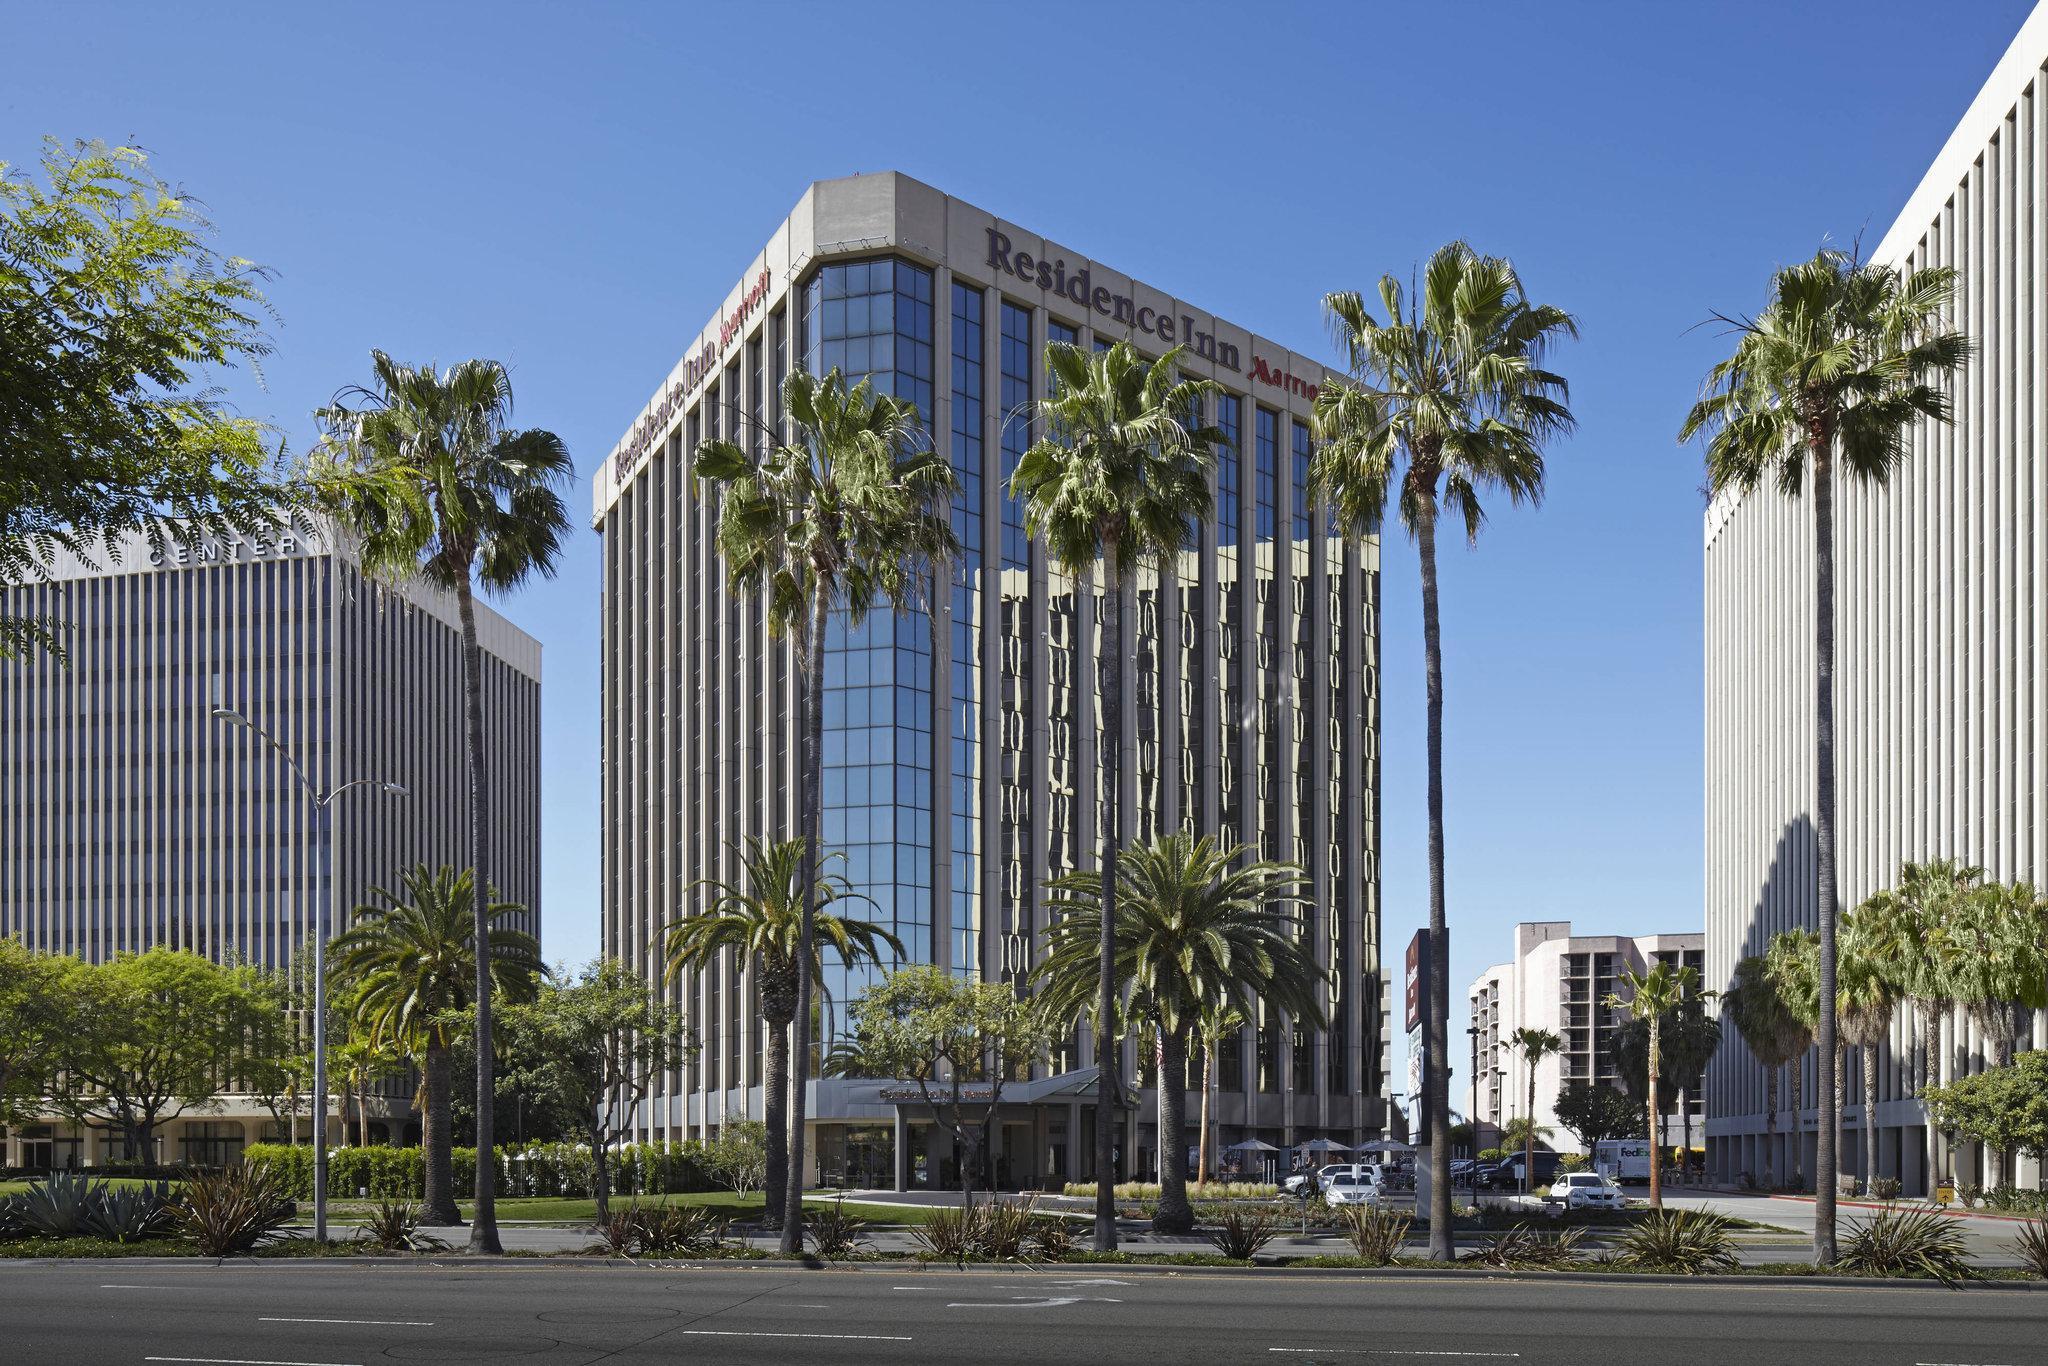 Residence Inn Los Angeles LAX/Century Boulevard, Los Angeles